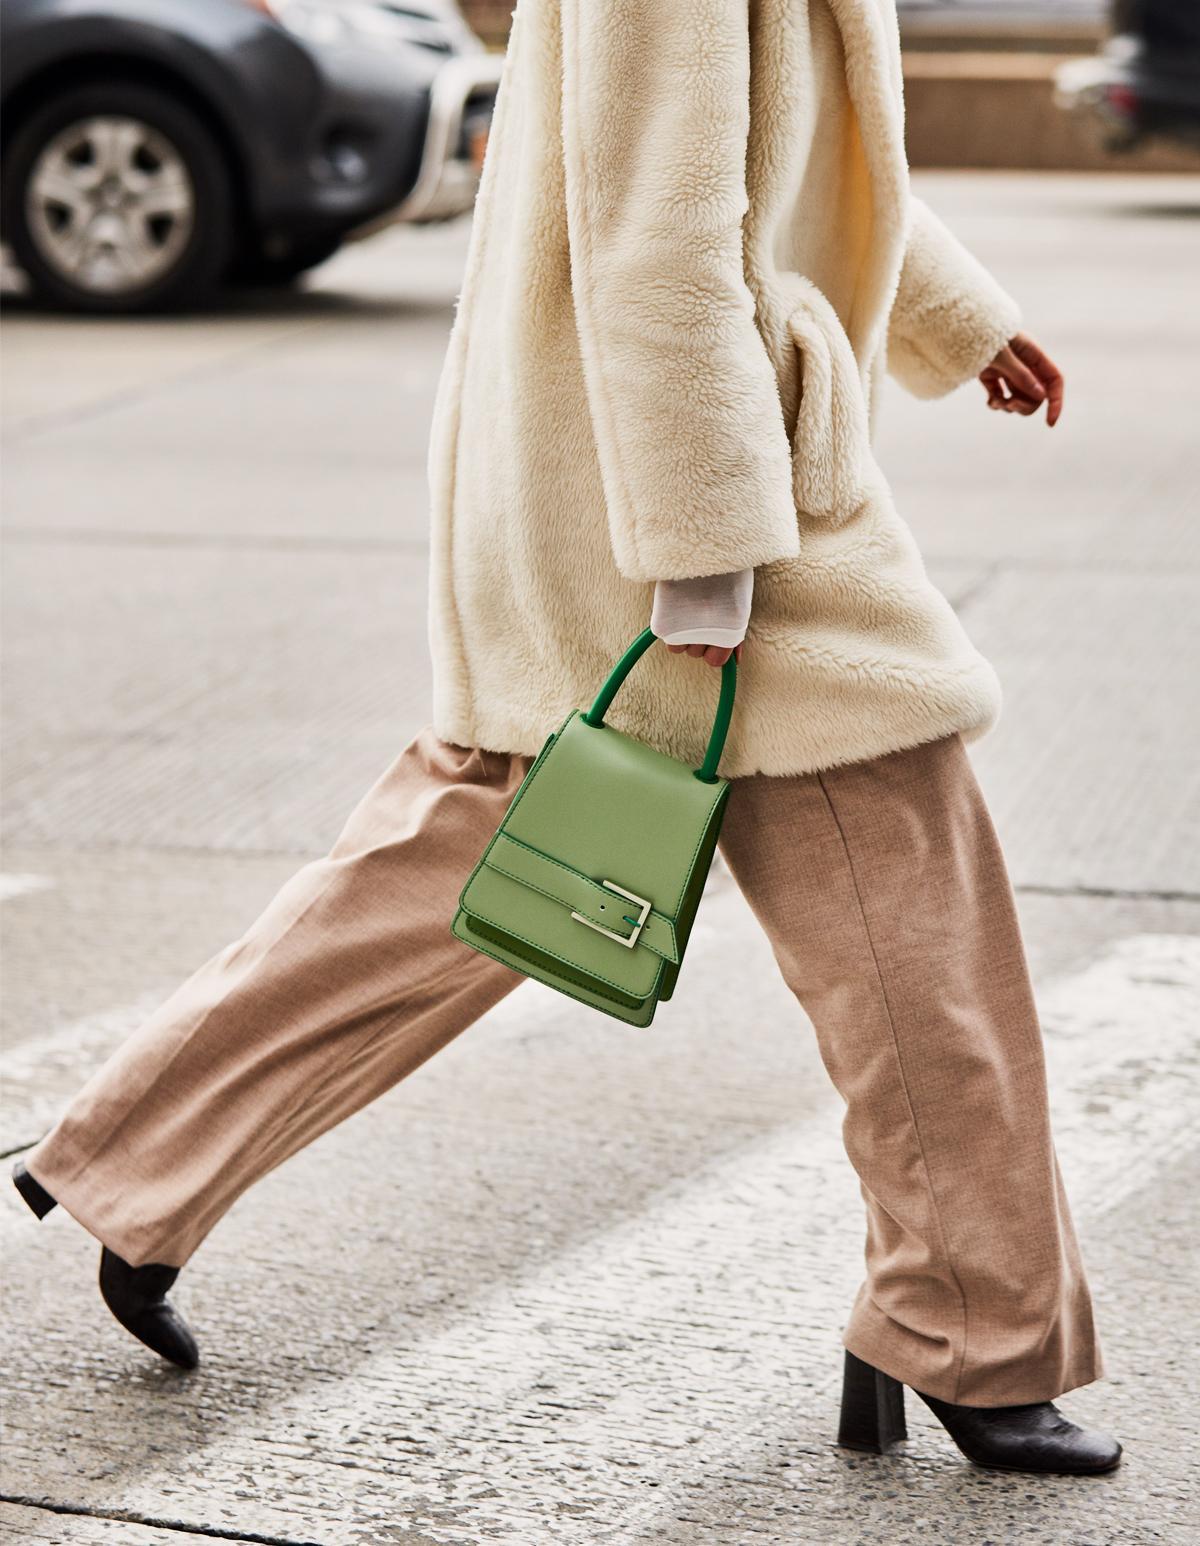 We Kept Seeing This £45 Handbag at New York Fashion Week